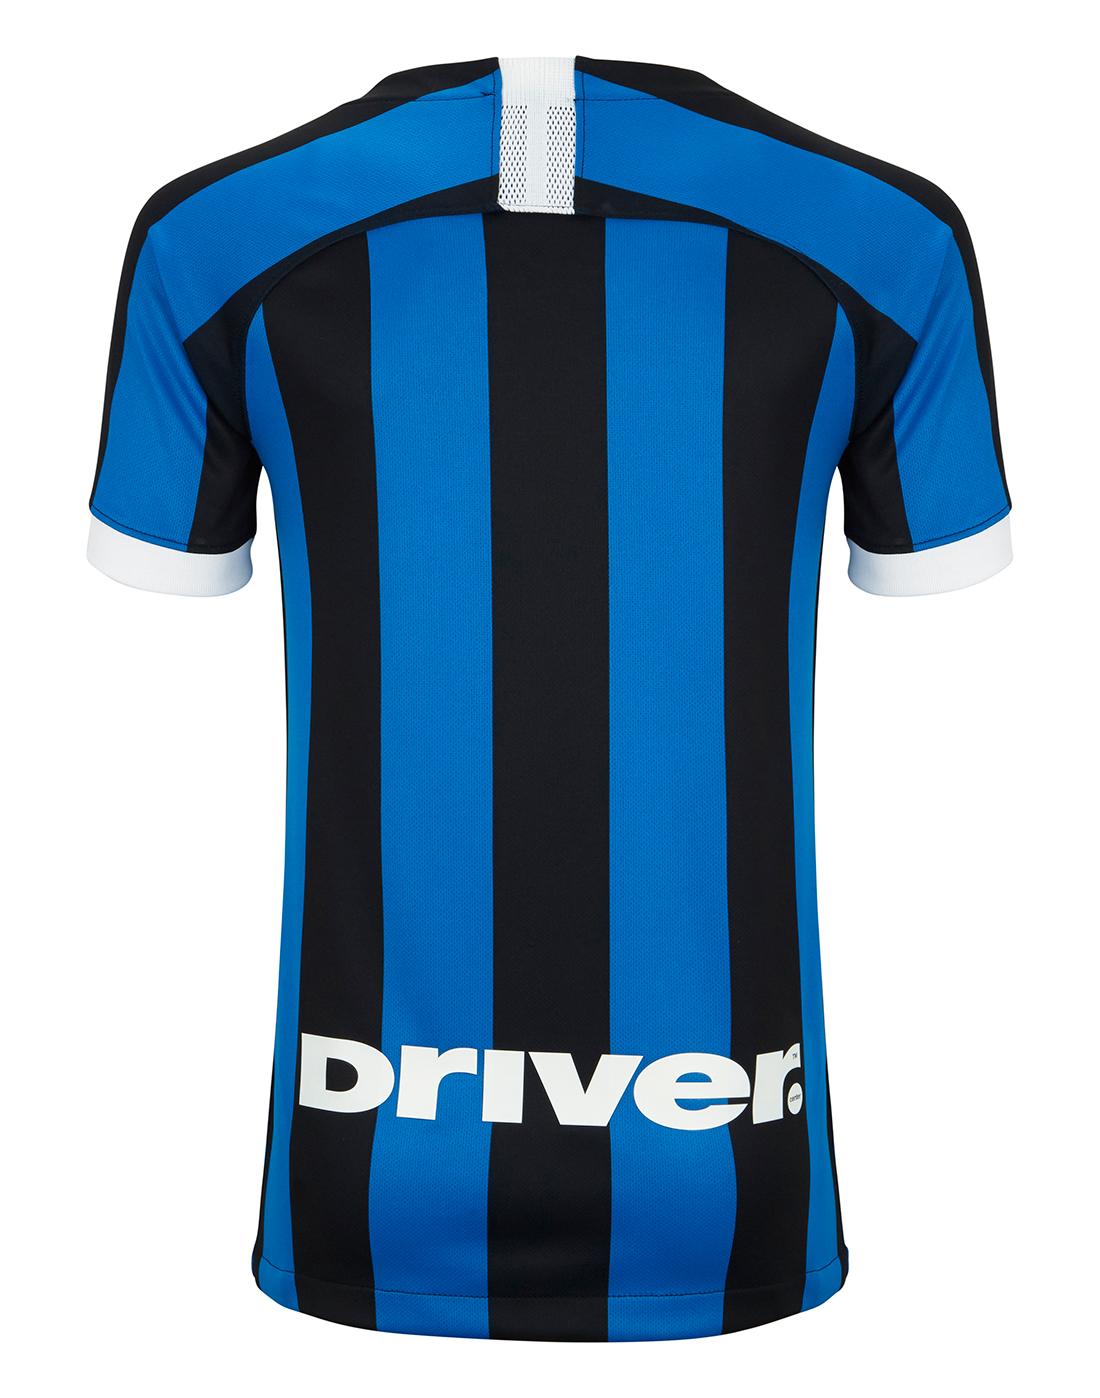 save off efad8 3a821 Nike Kids Inter Milan 19/20 Home Jersey